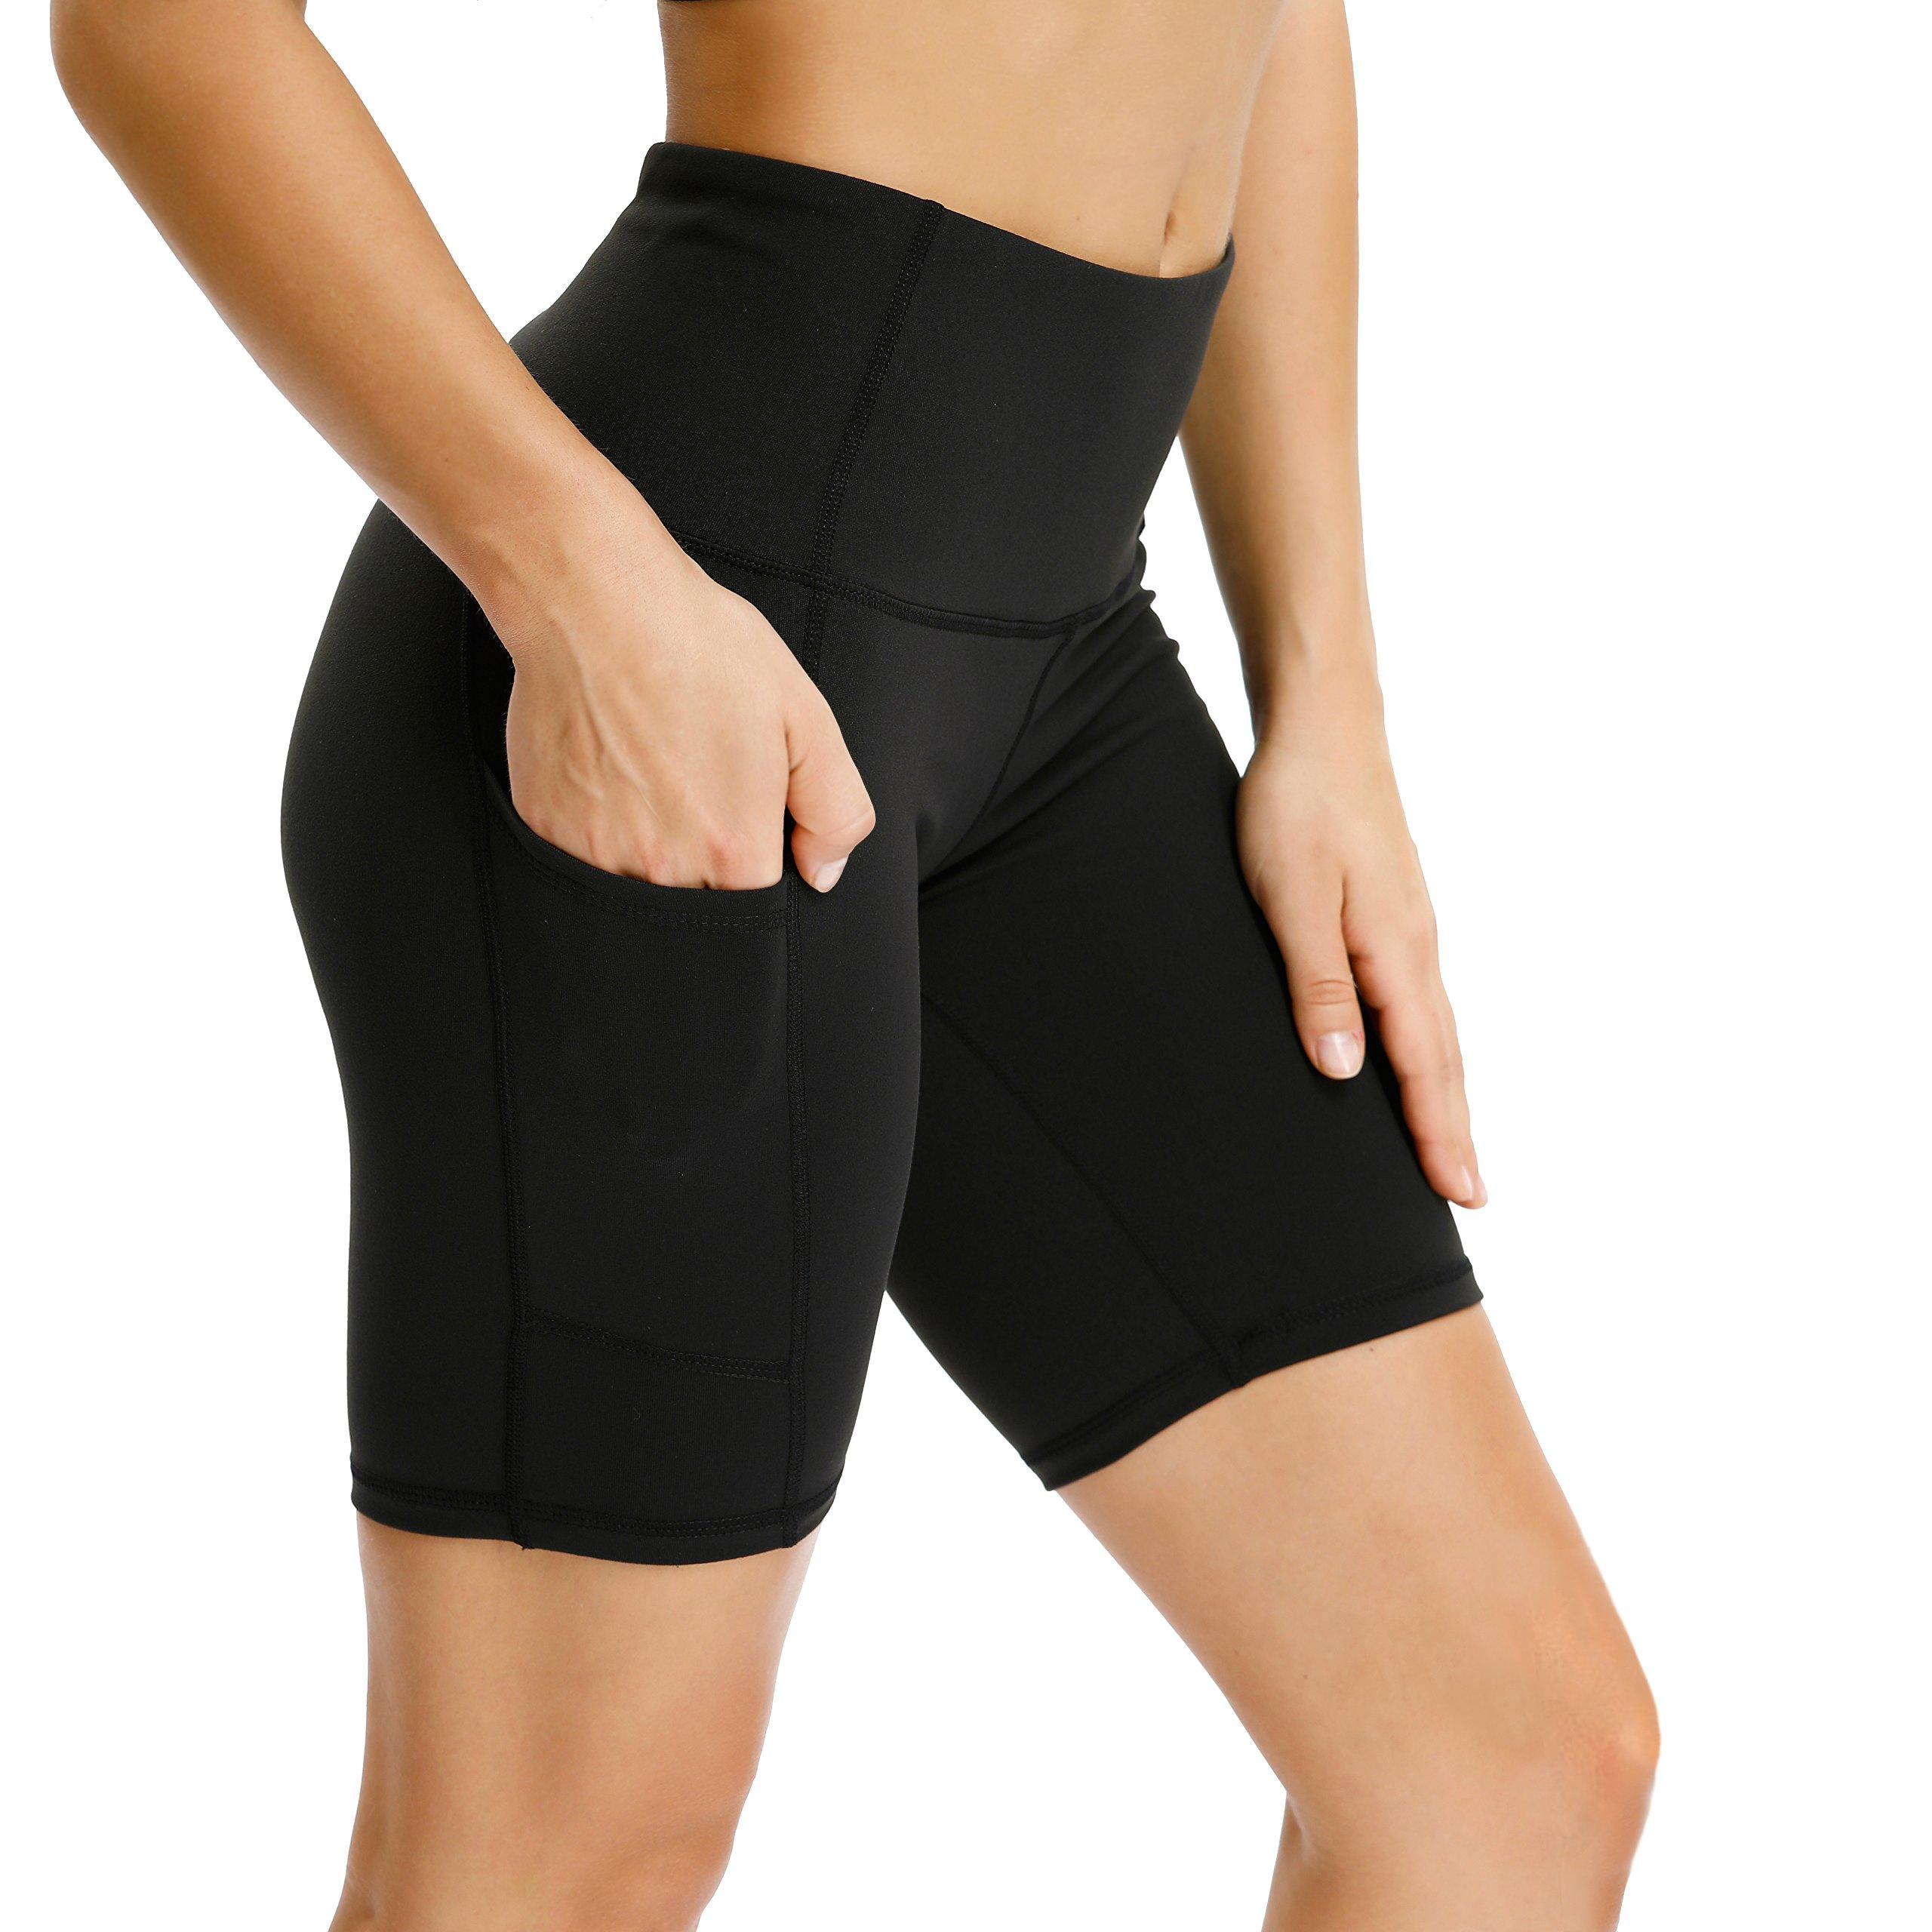 Vogyal Women's 8'' Yoga Shorts High Waist Tummy Control Workout Running Shorts with 2 Pockets -Black XL